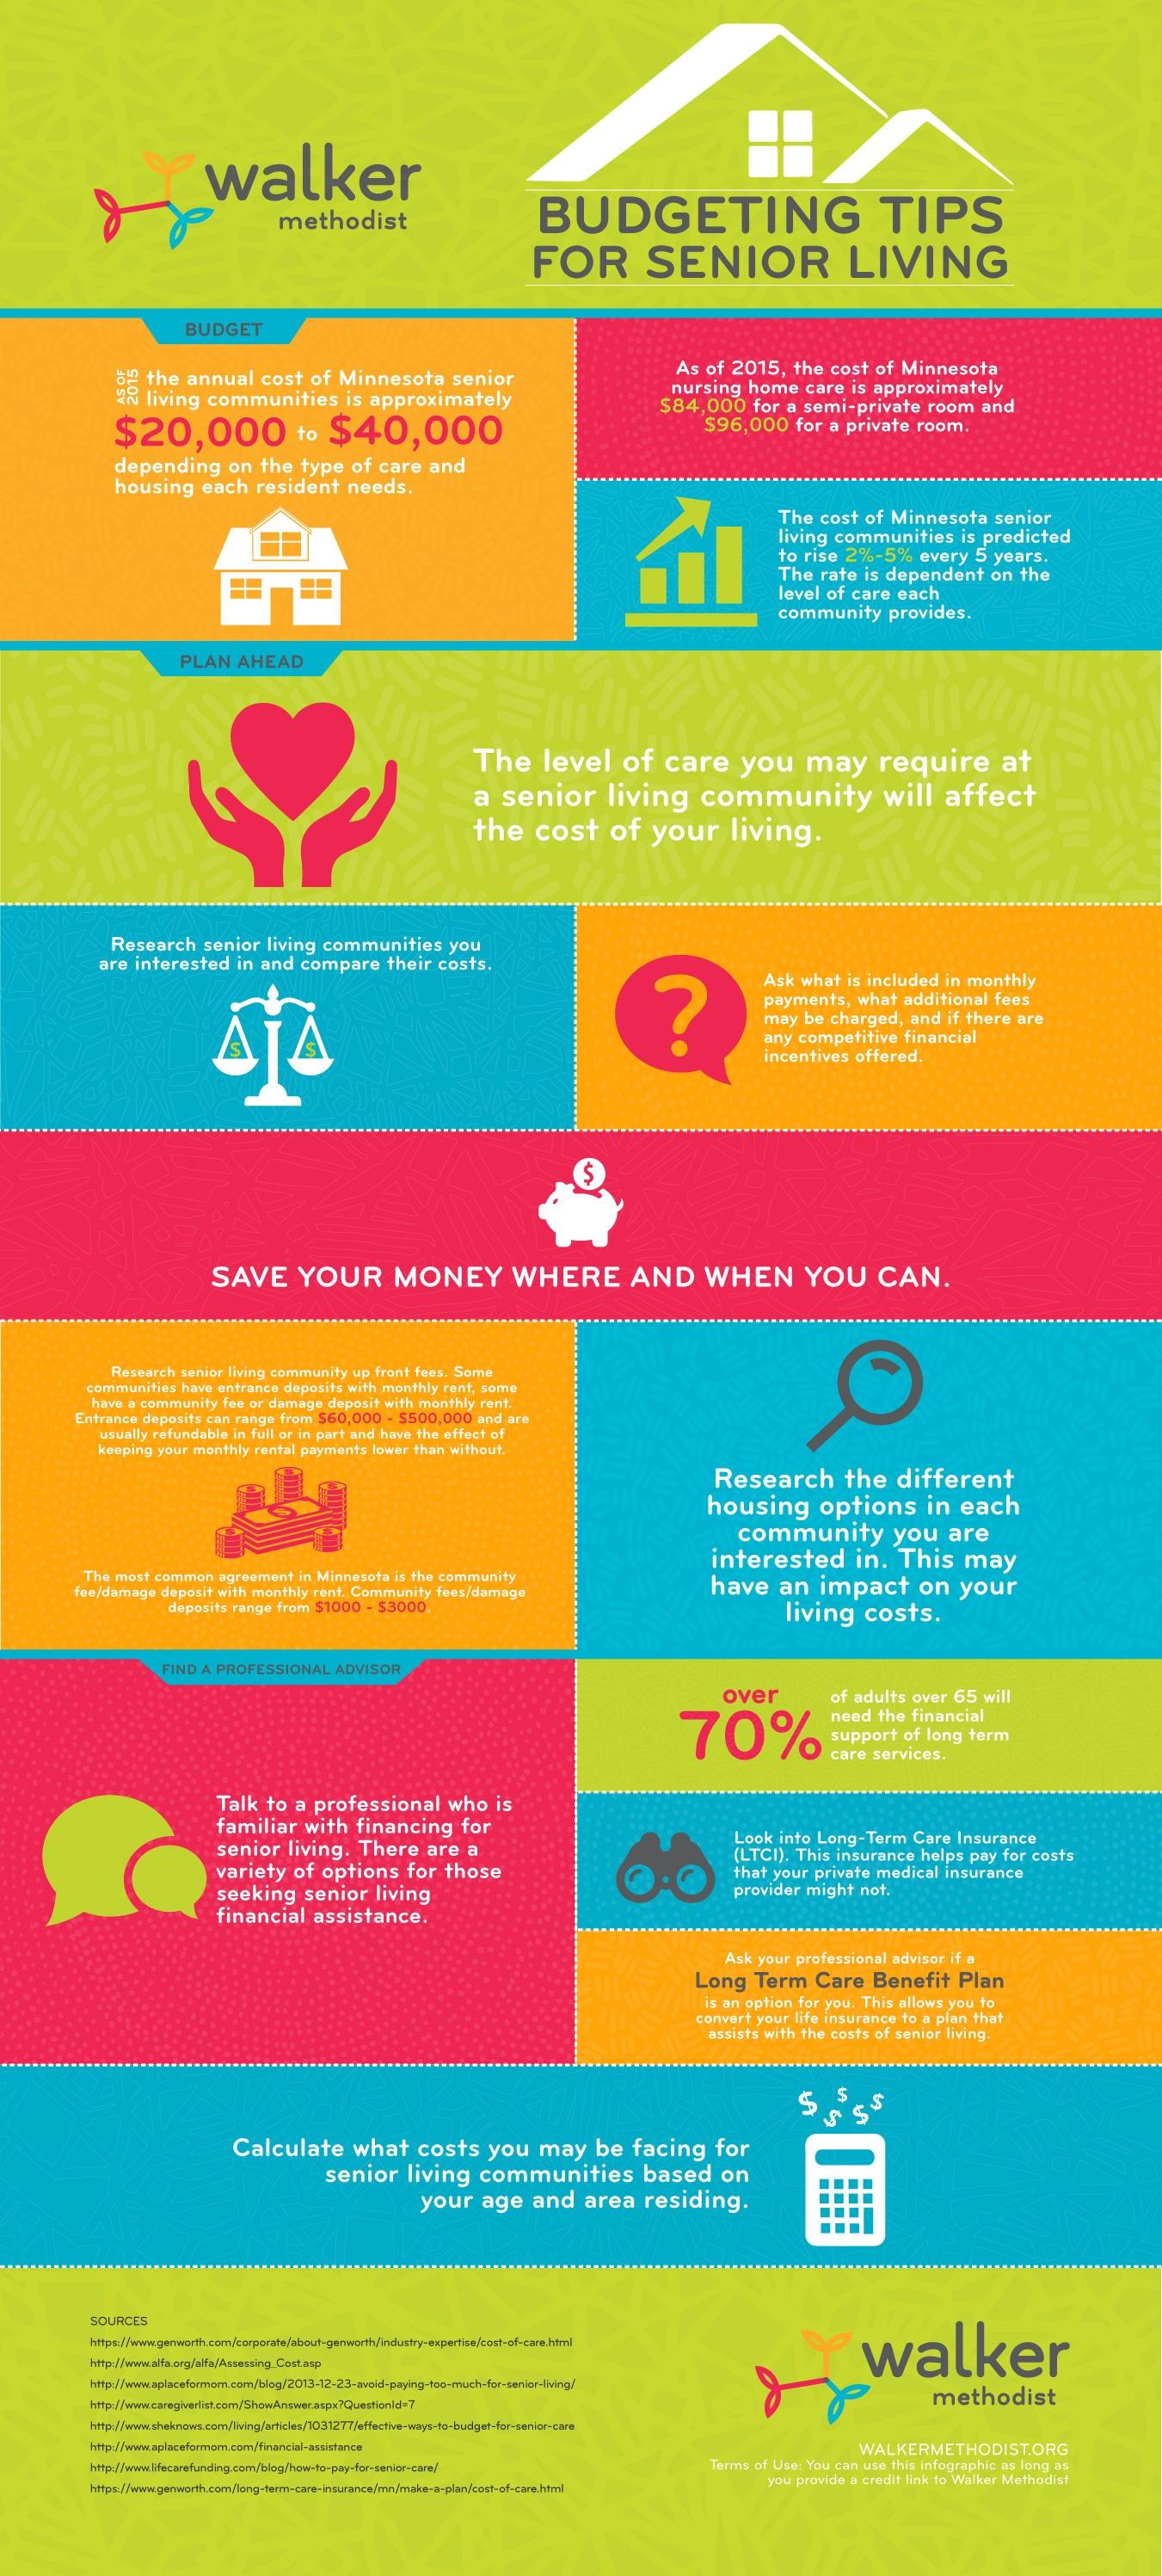 Walker-Budgeting_For_Senior_Living_Infographic